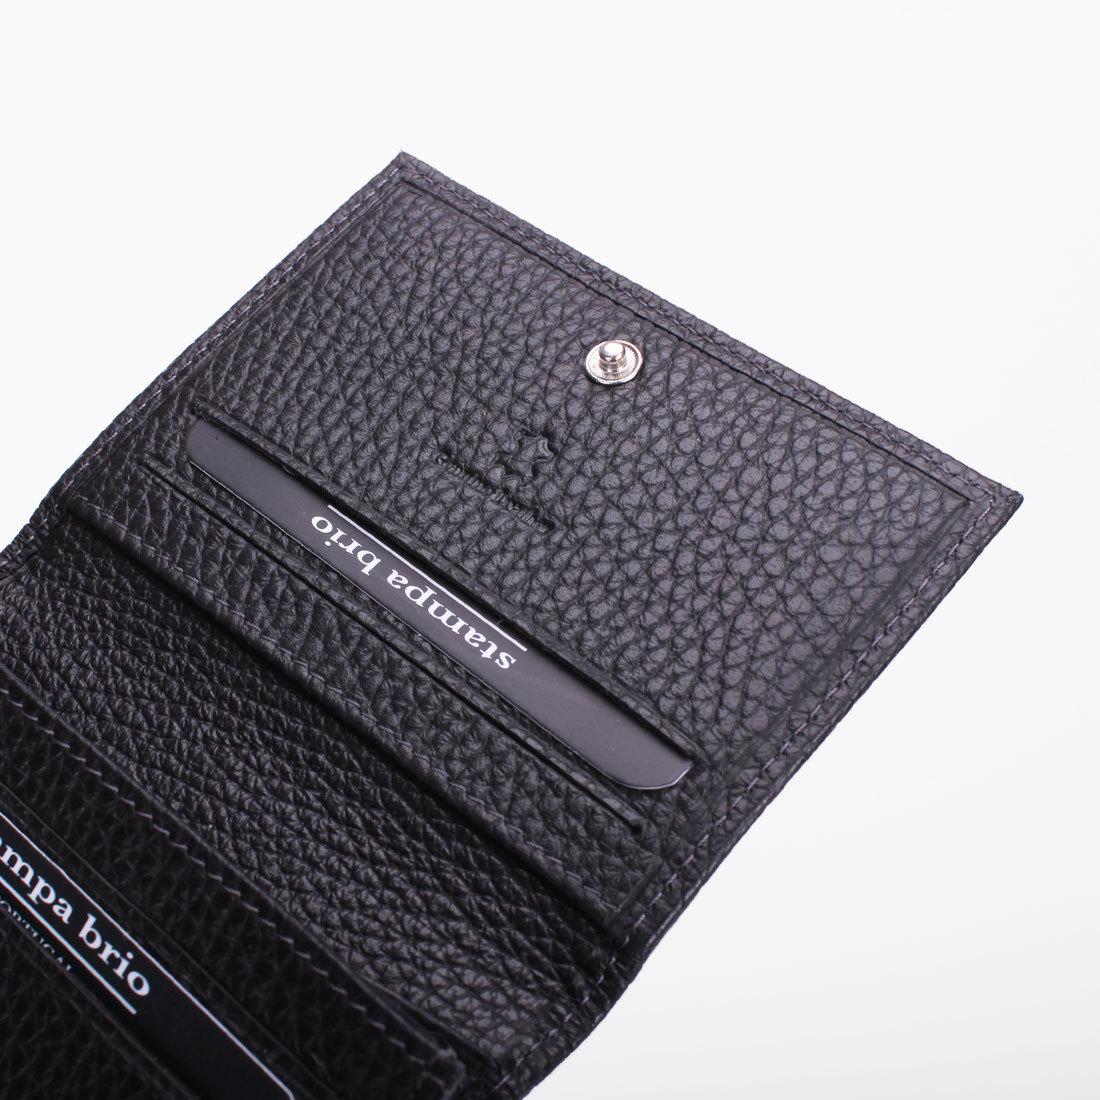 503 R - Футляр для карт и визиток с RFID защитой